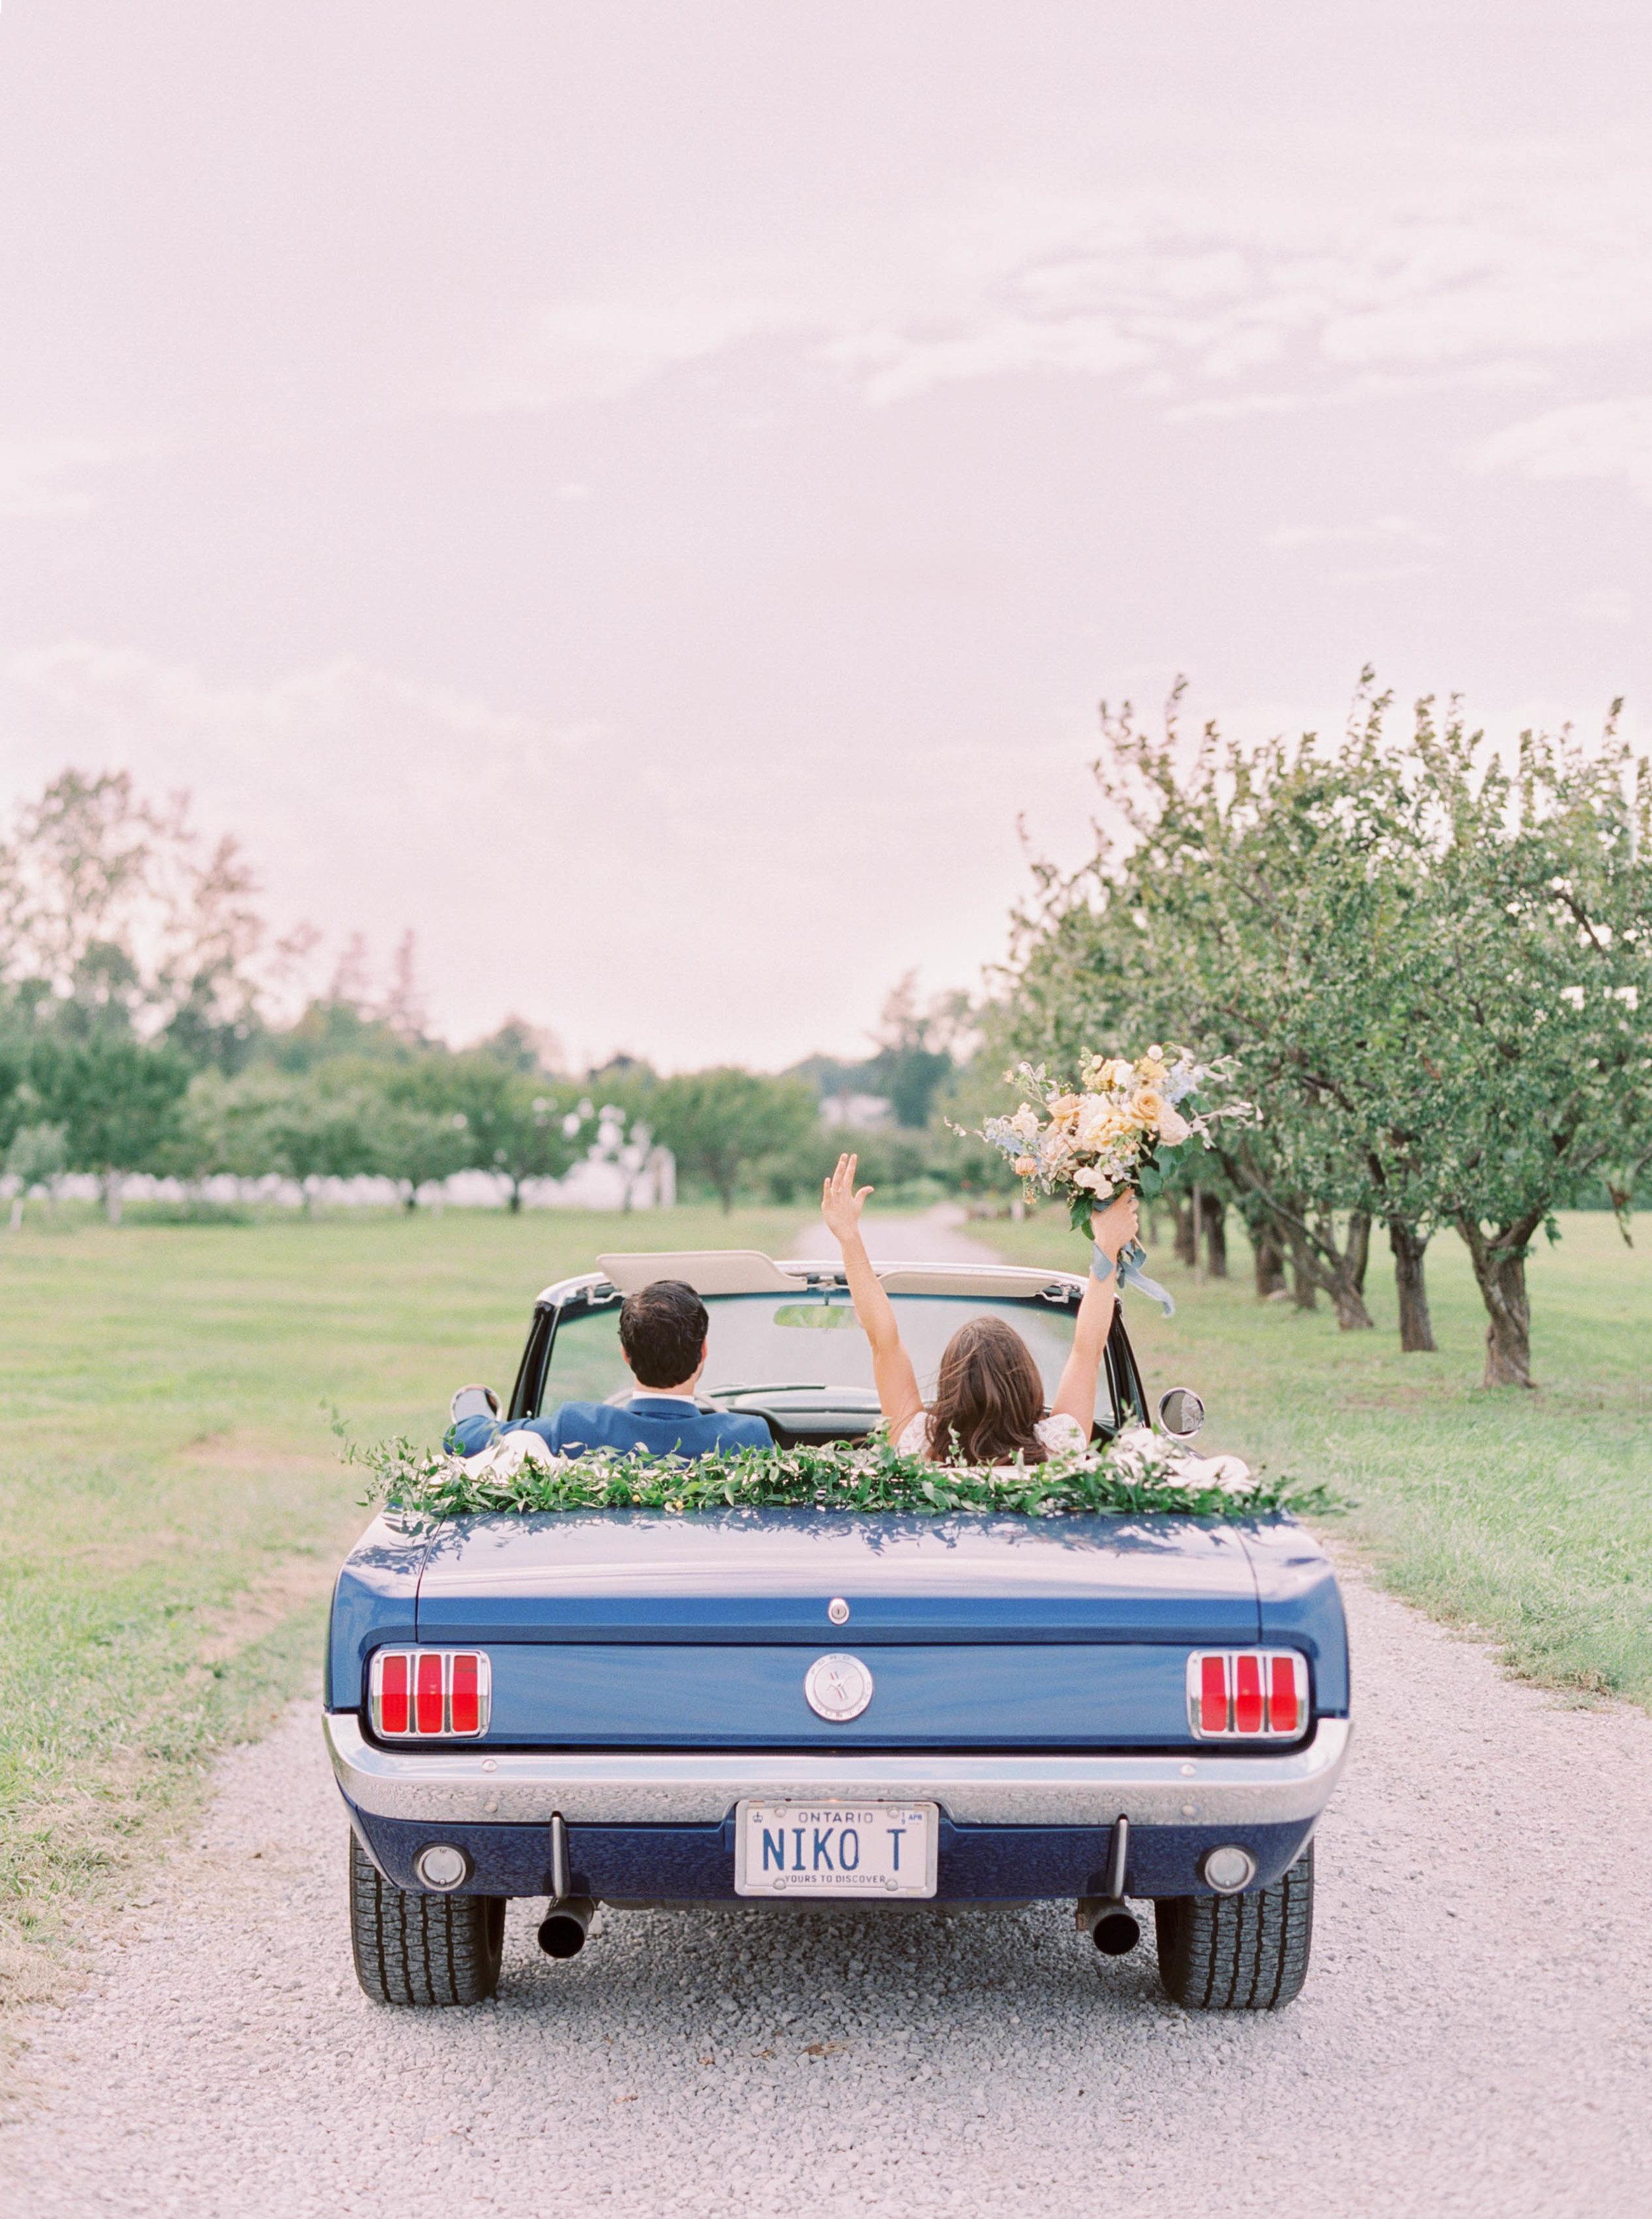 kurtz-gracewood-wedding-soft-airy-photographer-white-book-danielle-carmen-car.jpg